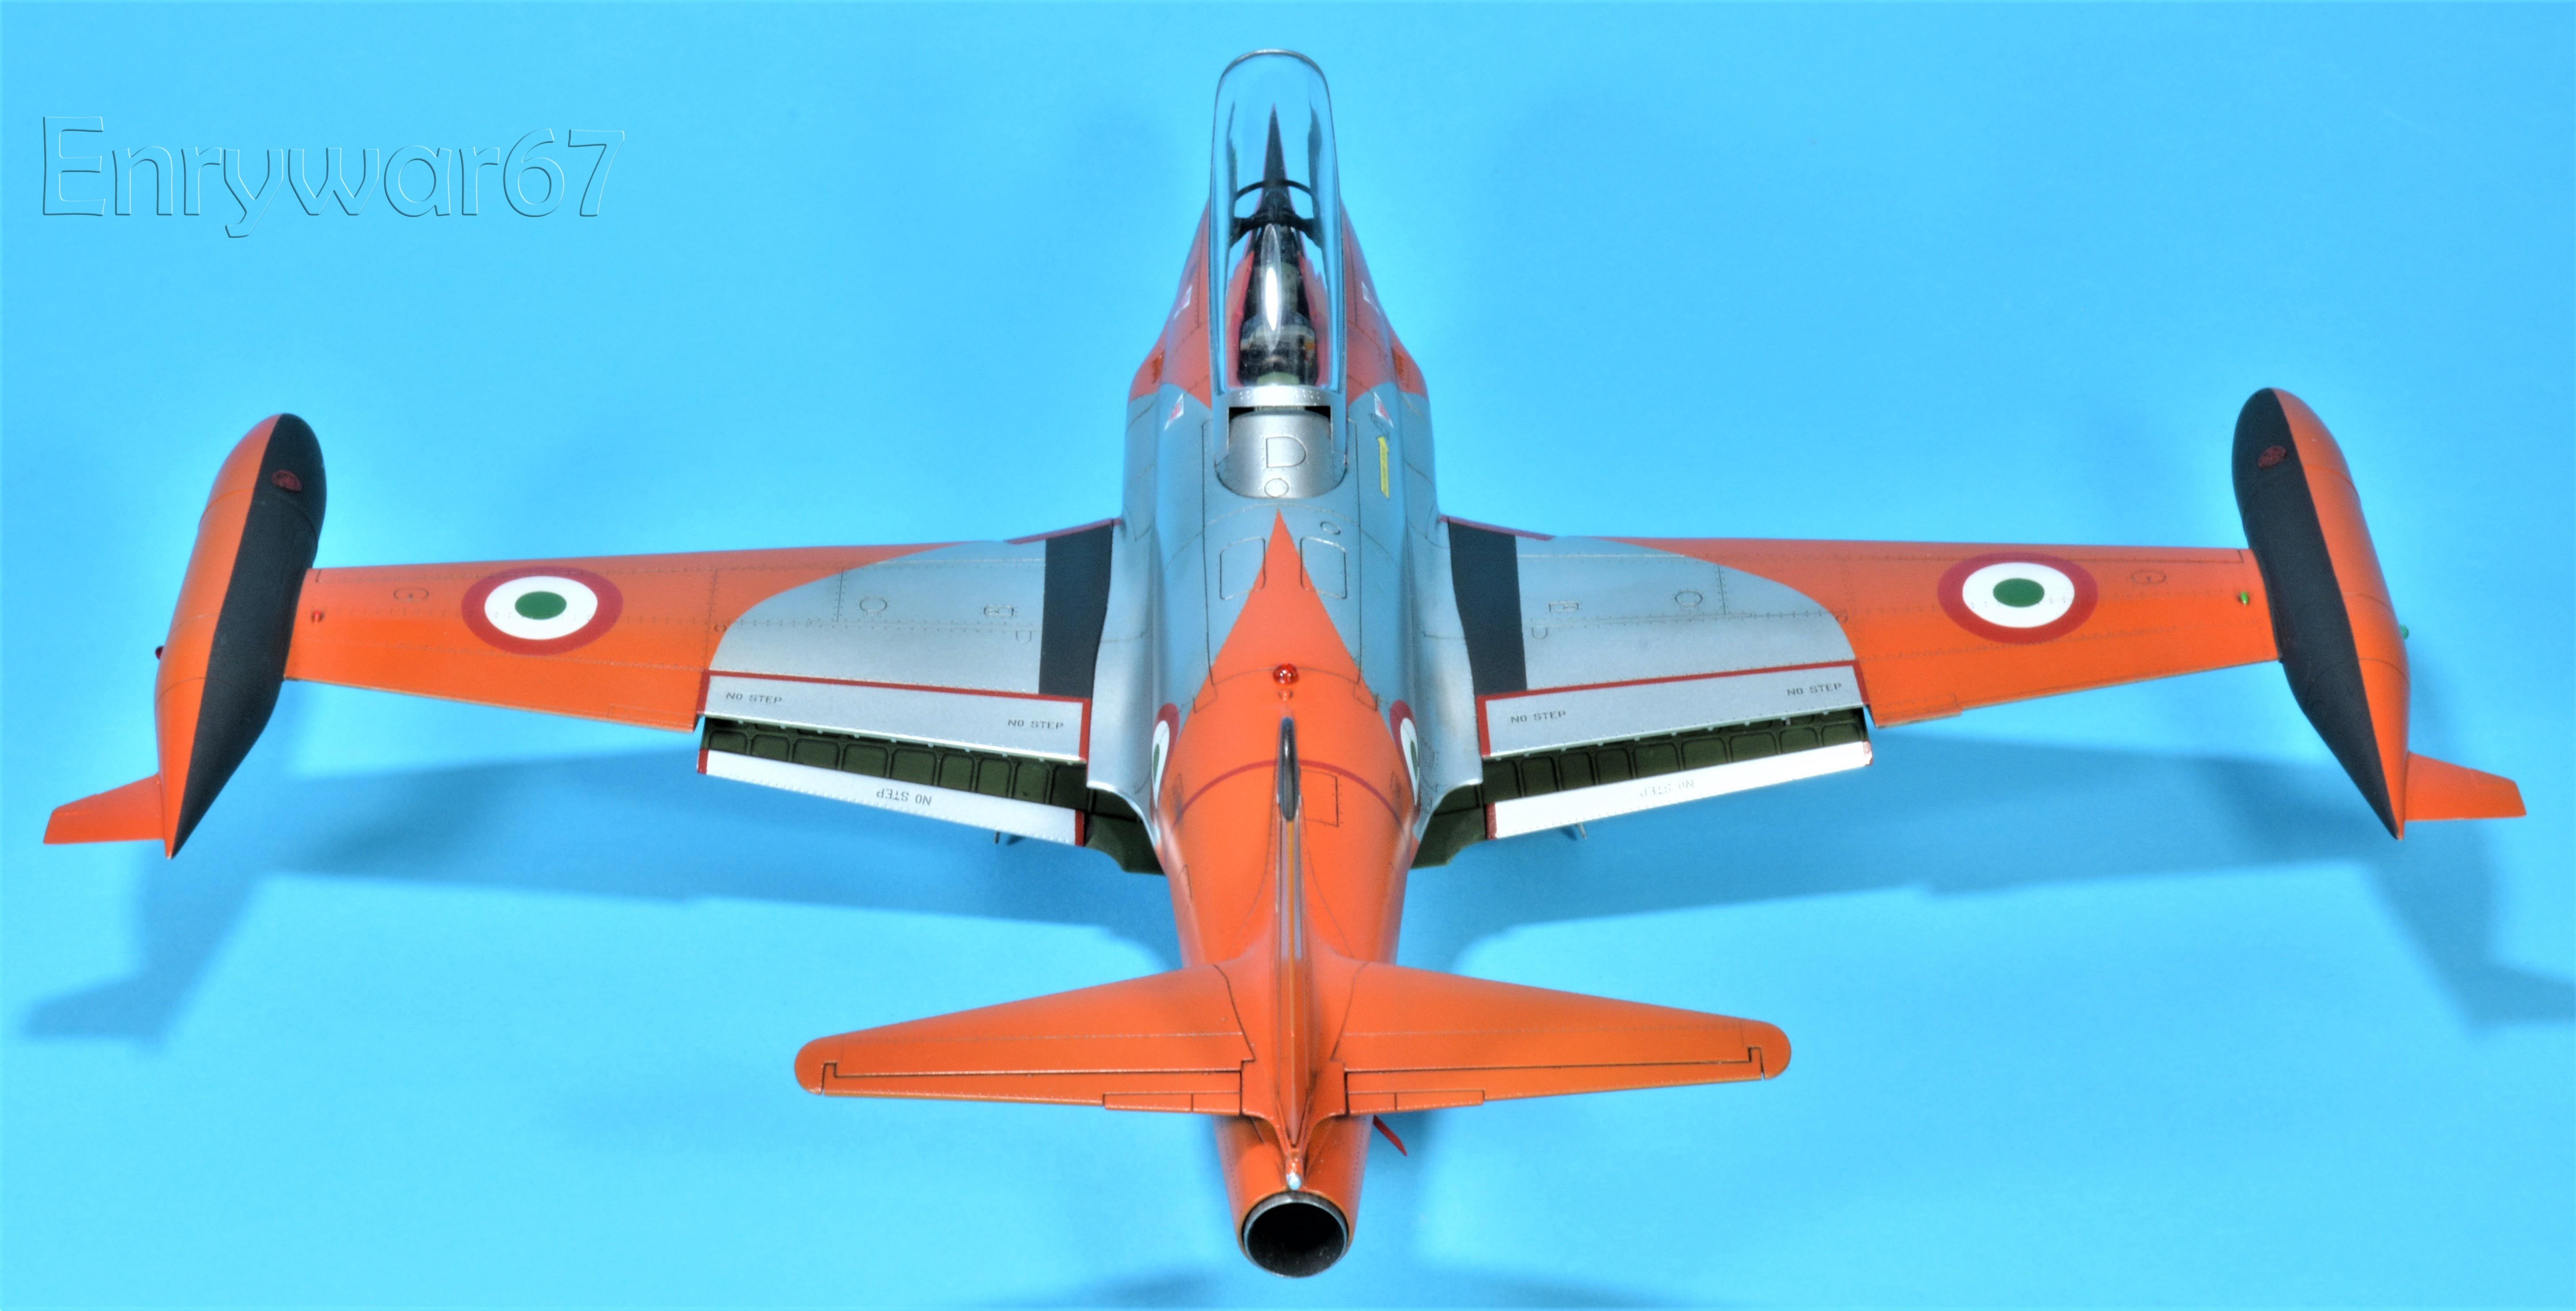 60fbb78c-9606-4d5e-a5cf-b36c94bccc88.jpg